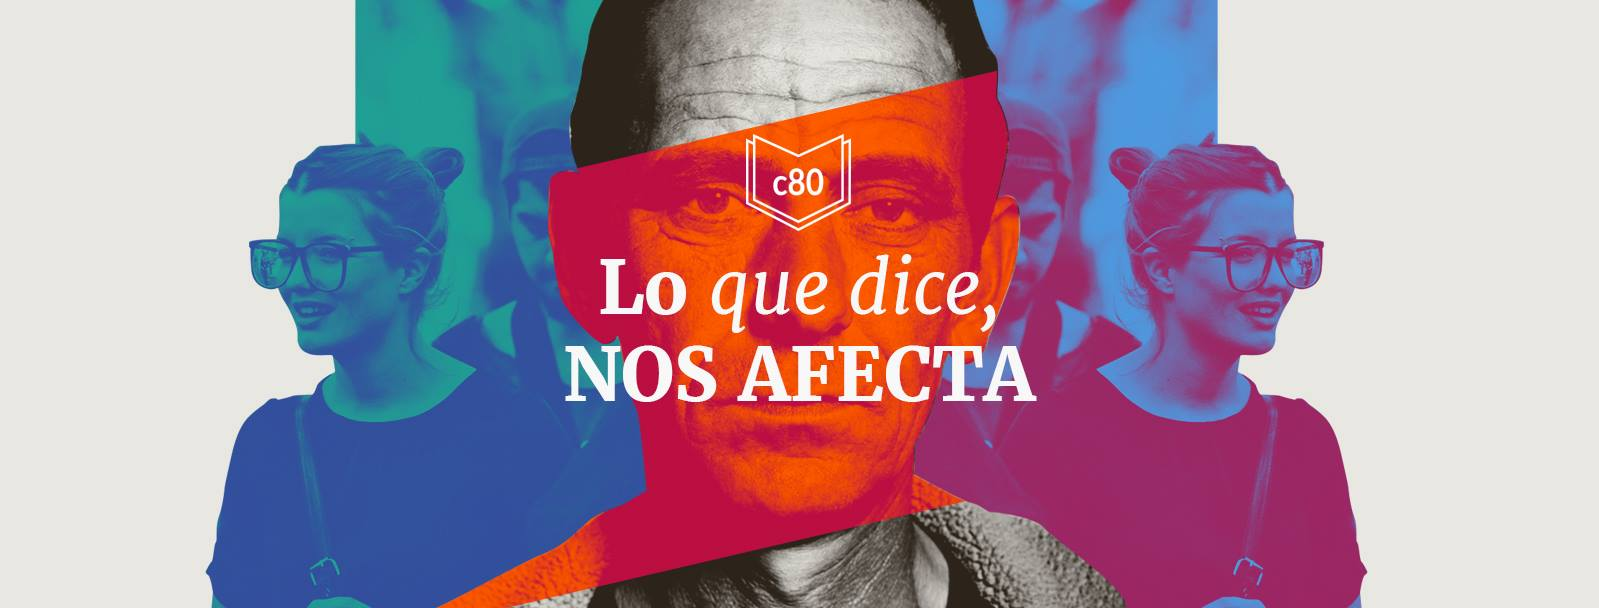 (c) C80.cl